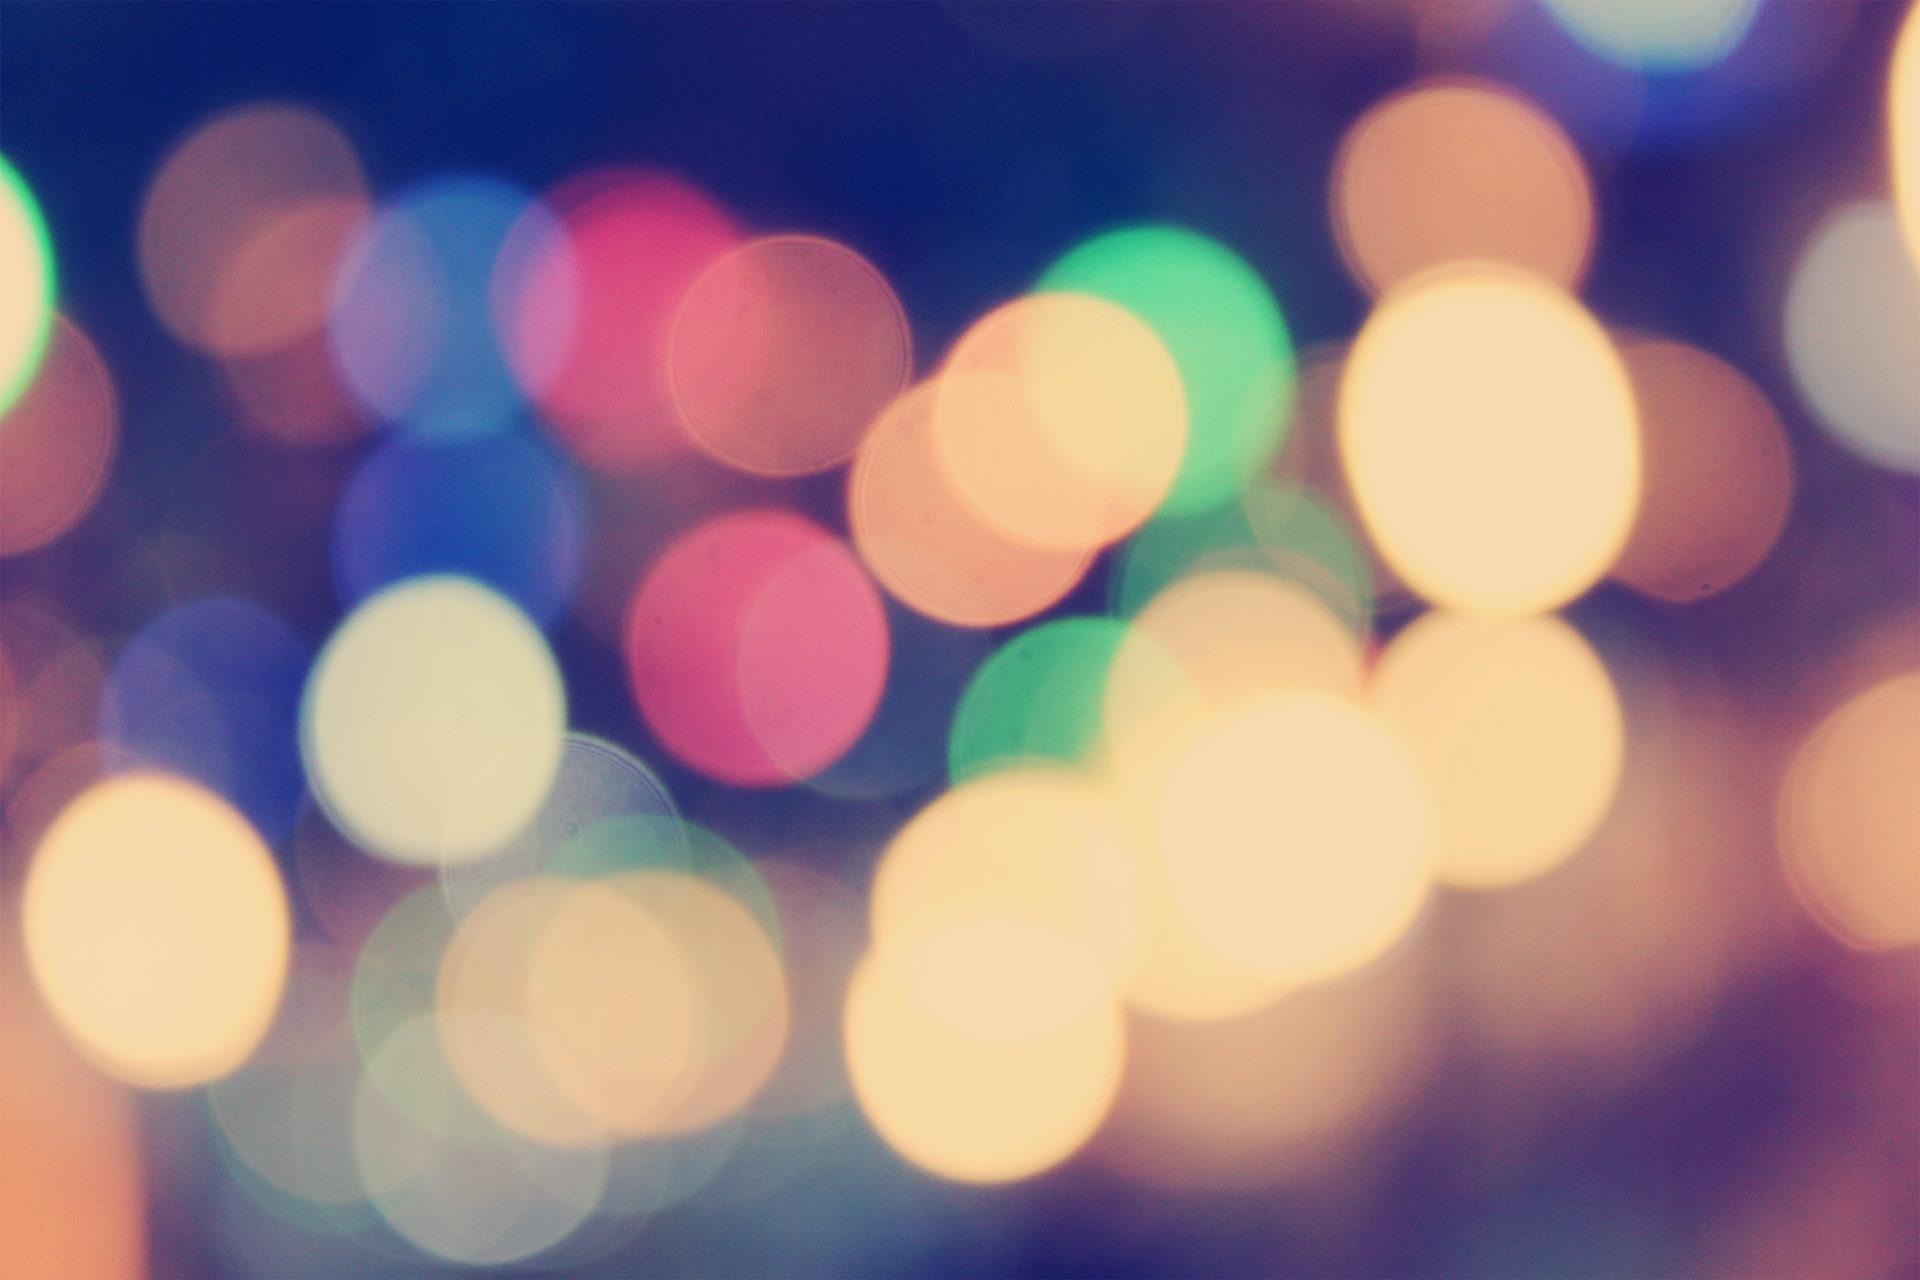 luci, notte, Città, traffico, sfocatura - Sfondi HD - Professor-falken.com